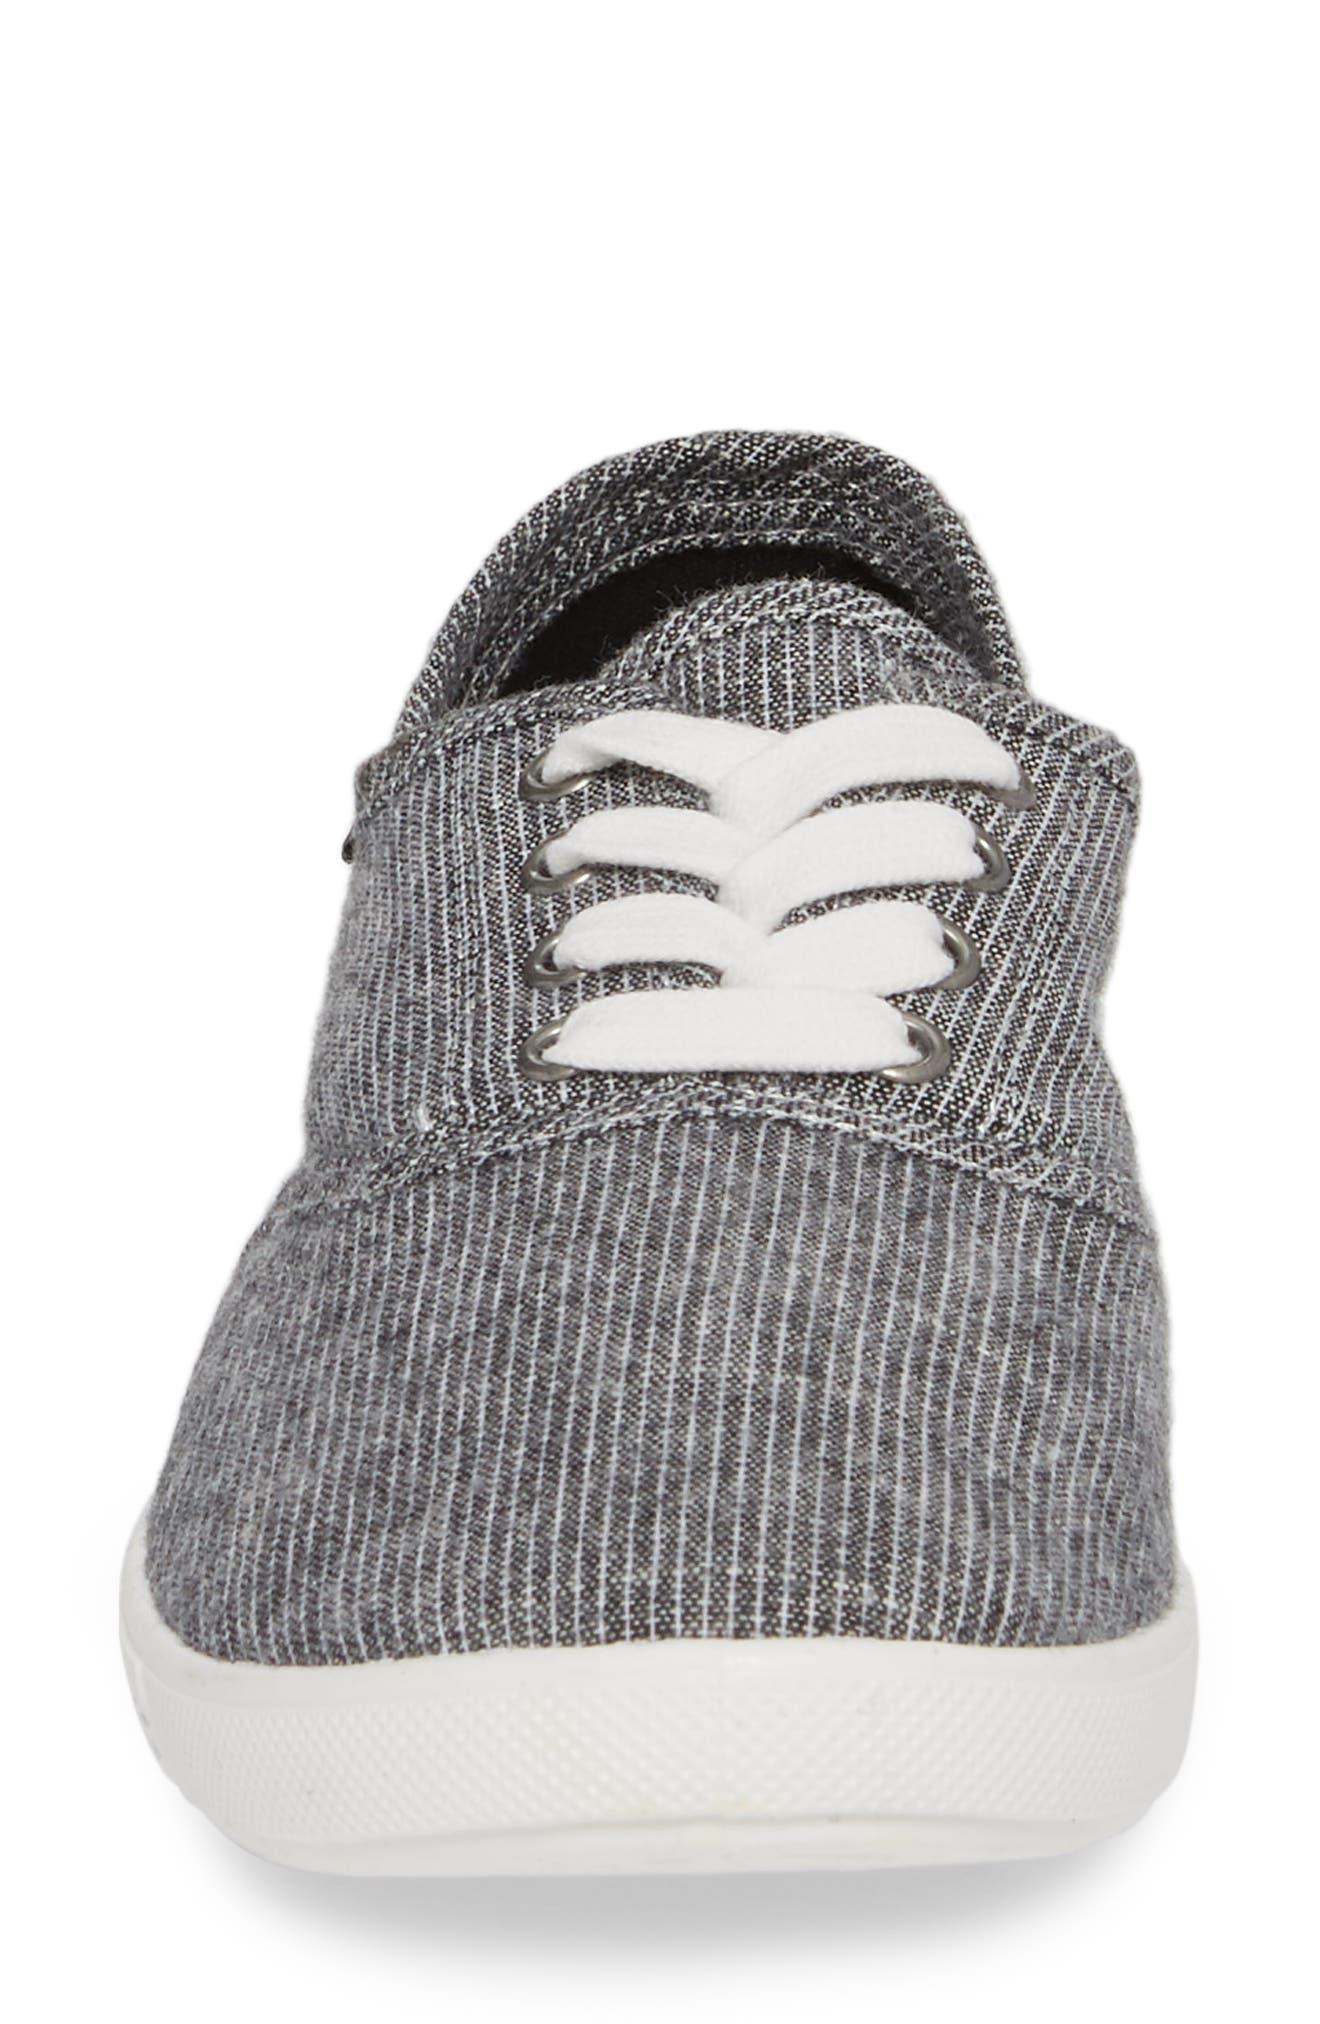 Addy Sneaker,                             Alternate thumbnail 4, color,                             Black/ White